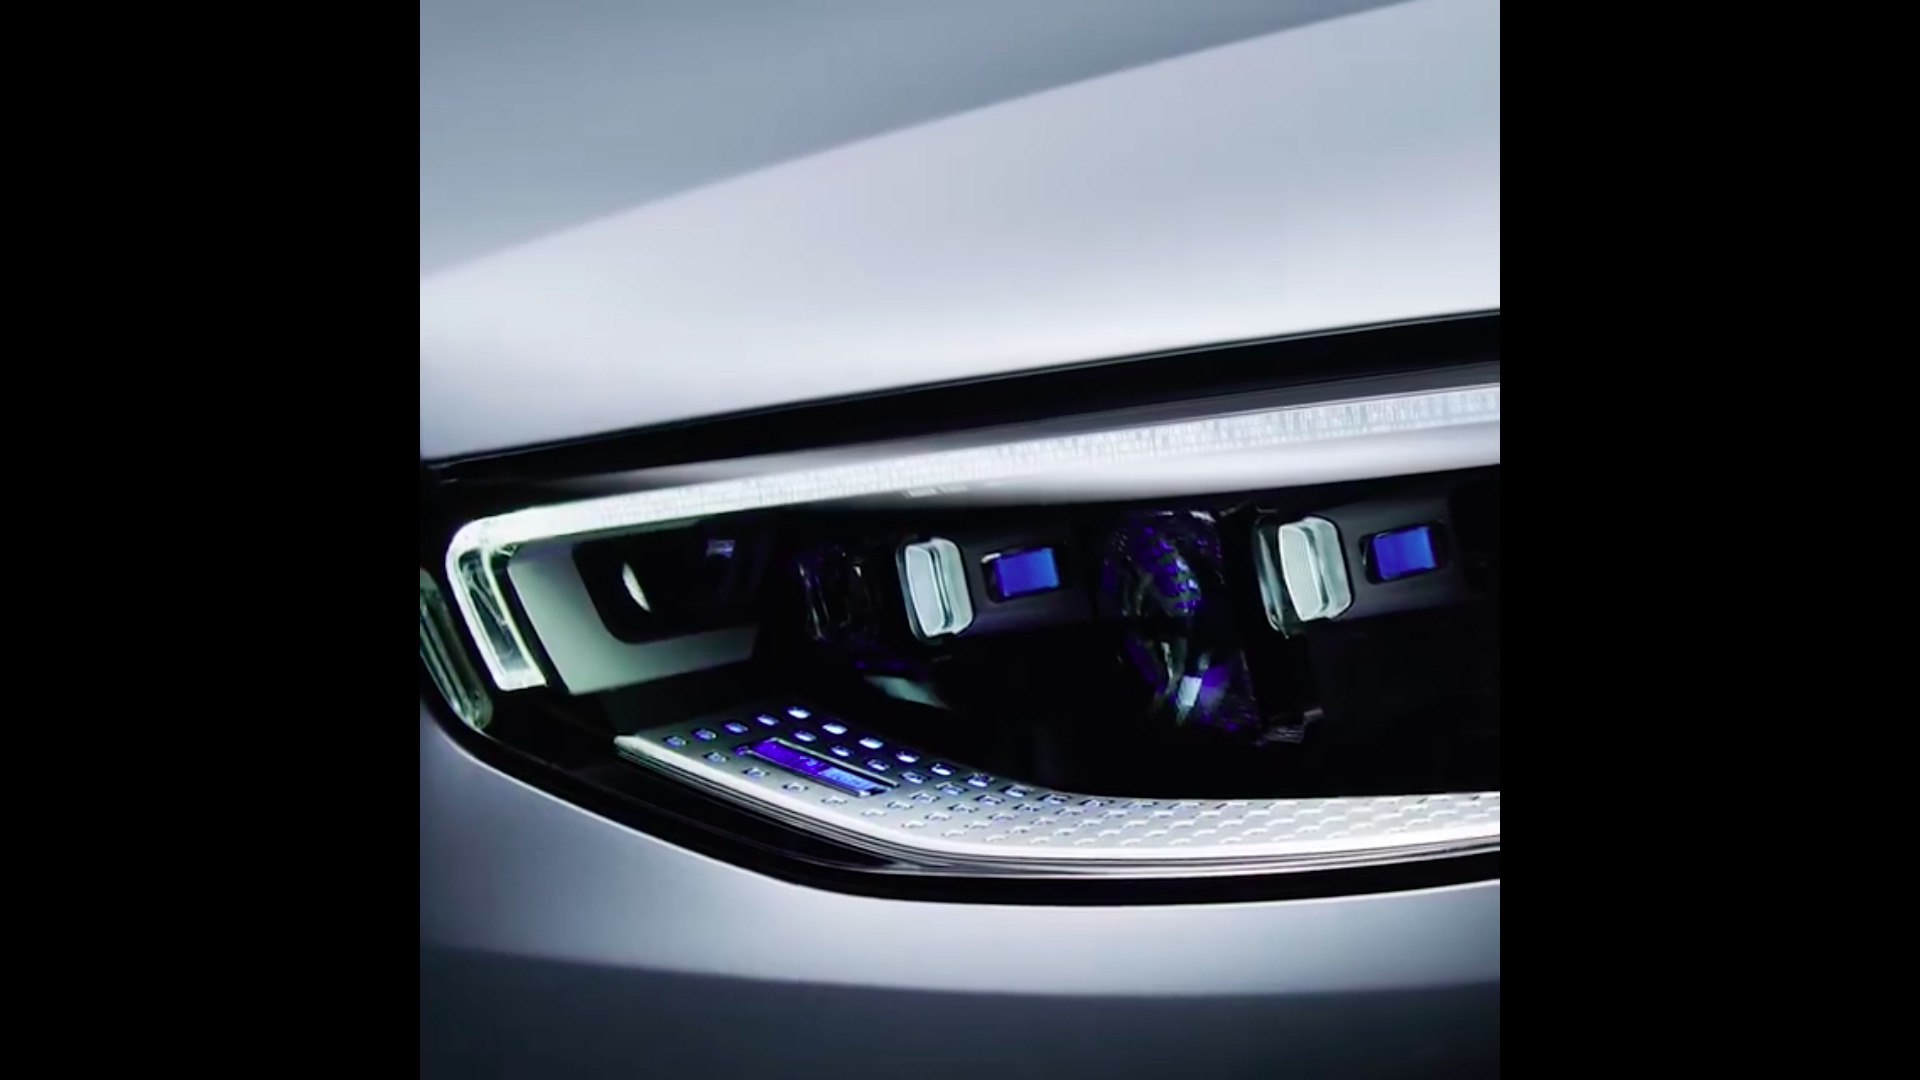 Mercedes Classe S 2021 video teaser